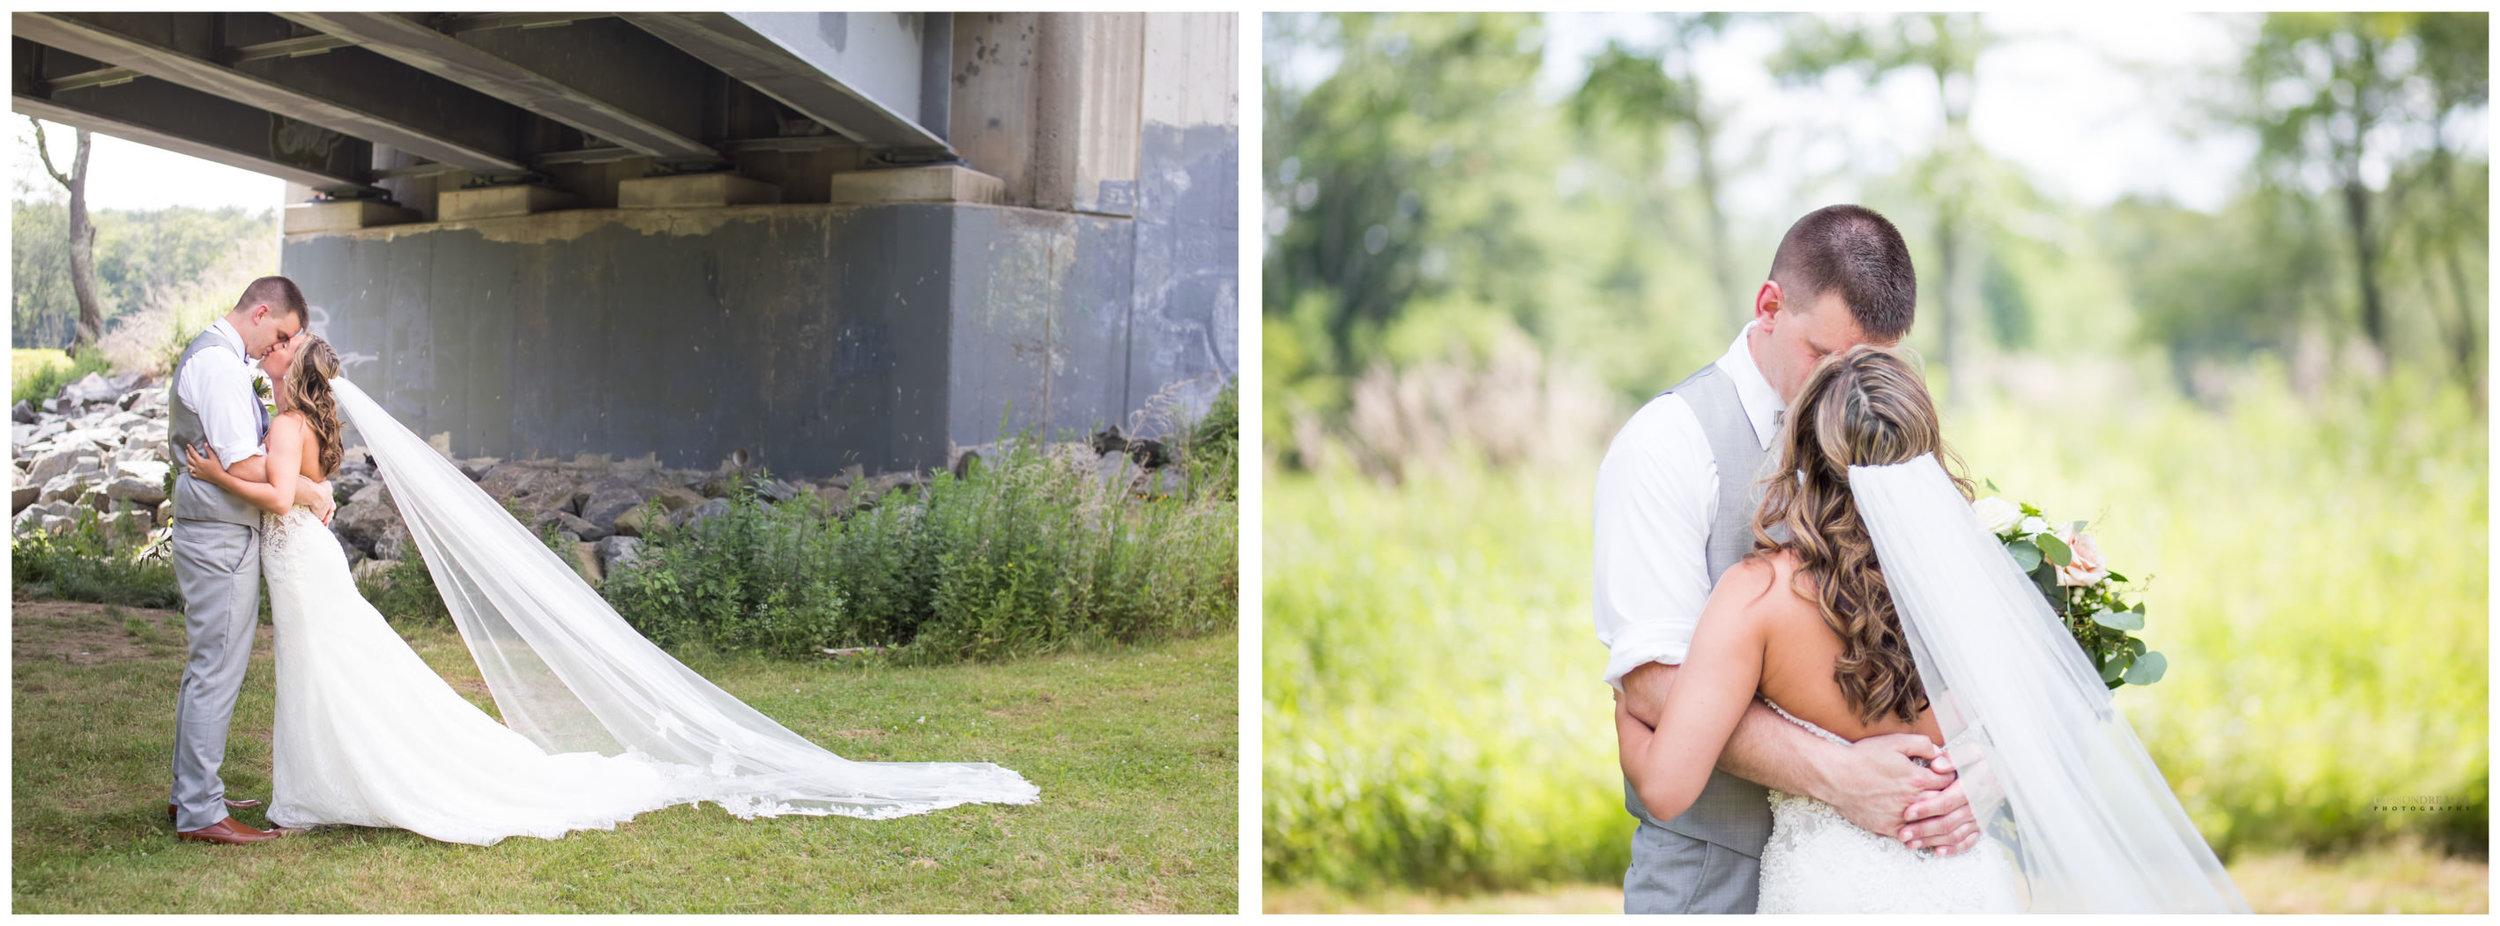 Cassondre Mae Photography Hudson Valley Wedding 10.jpg